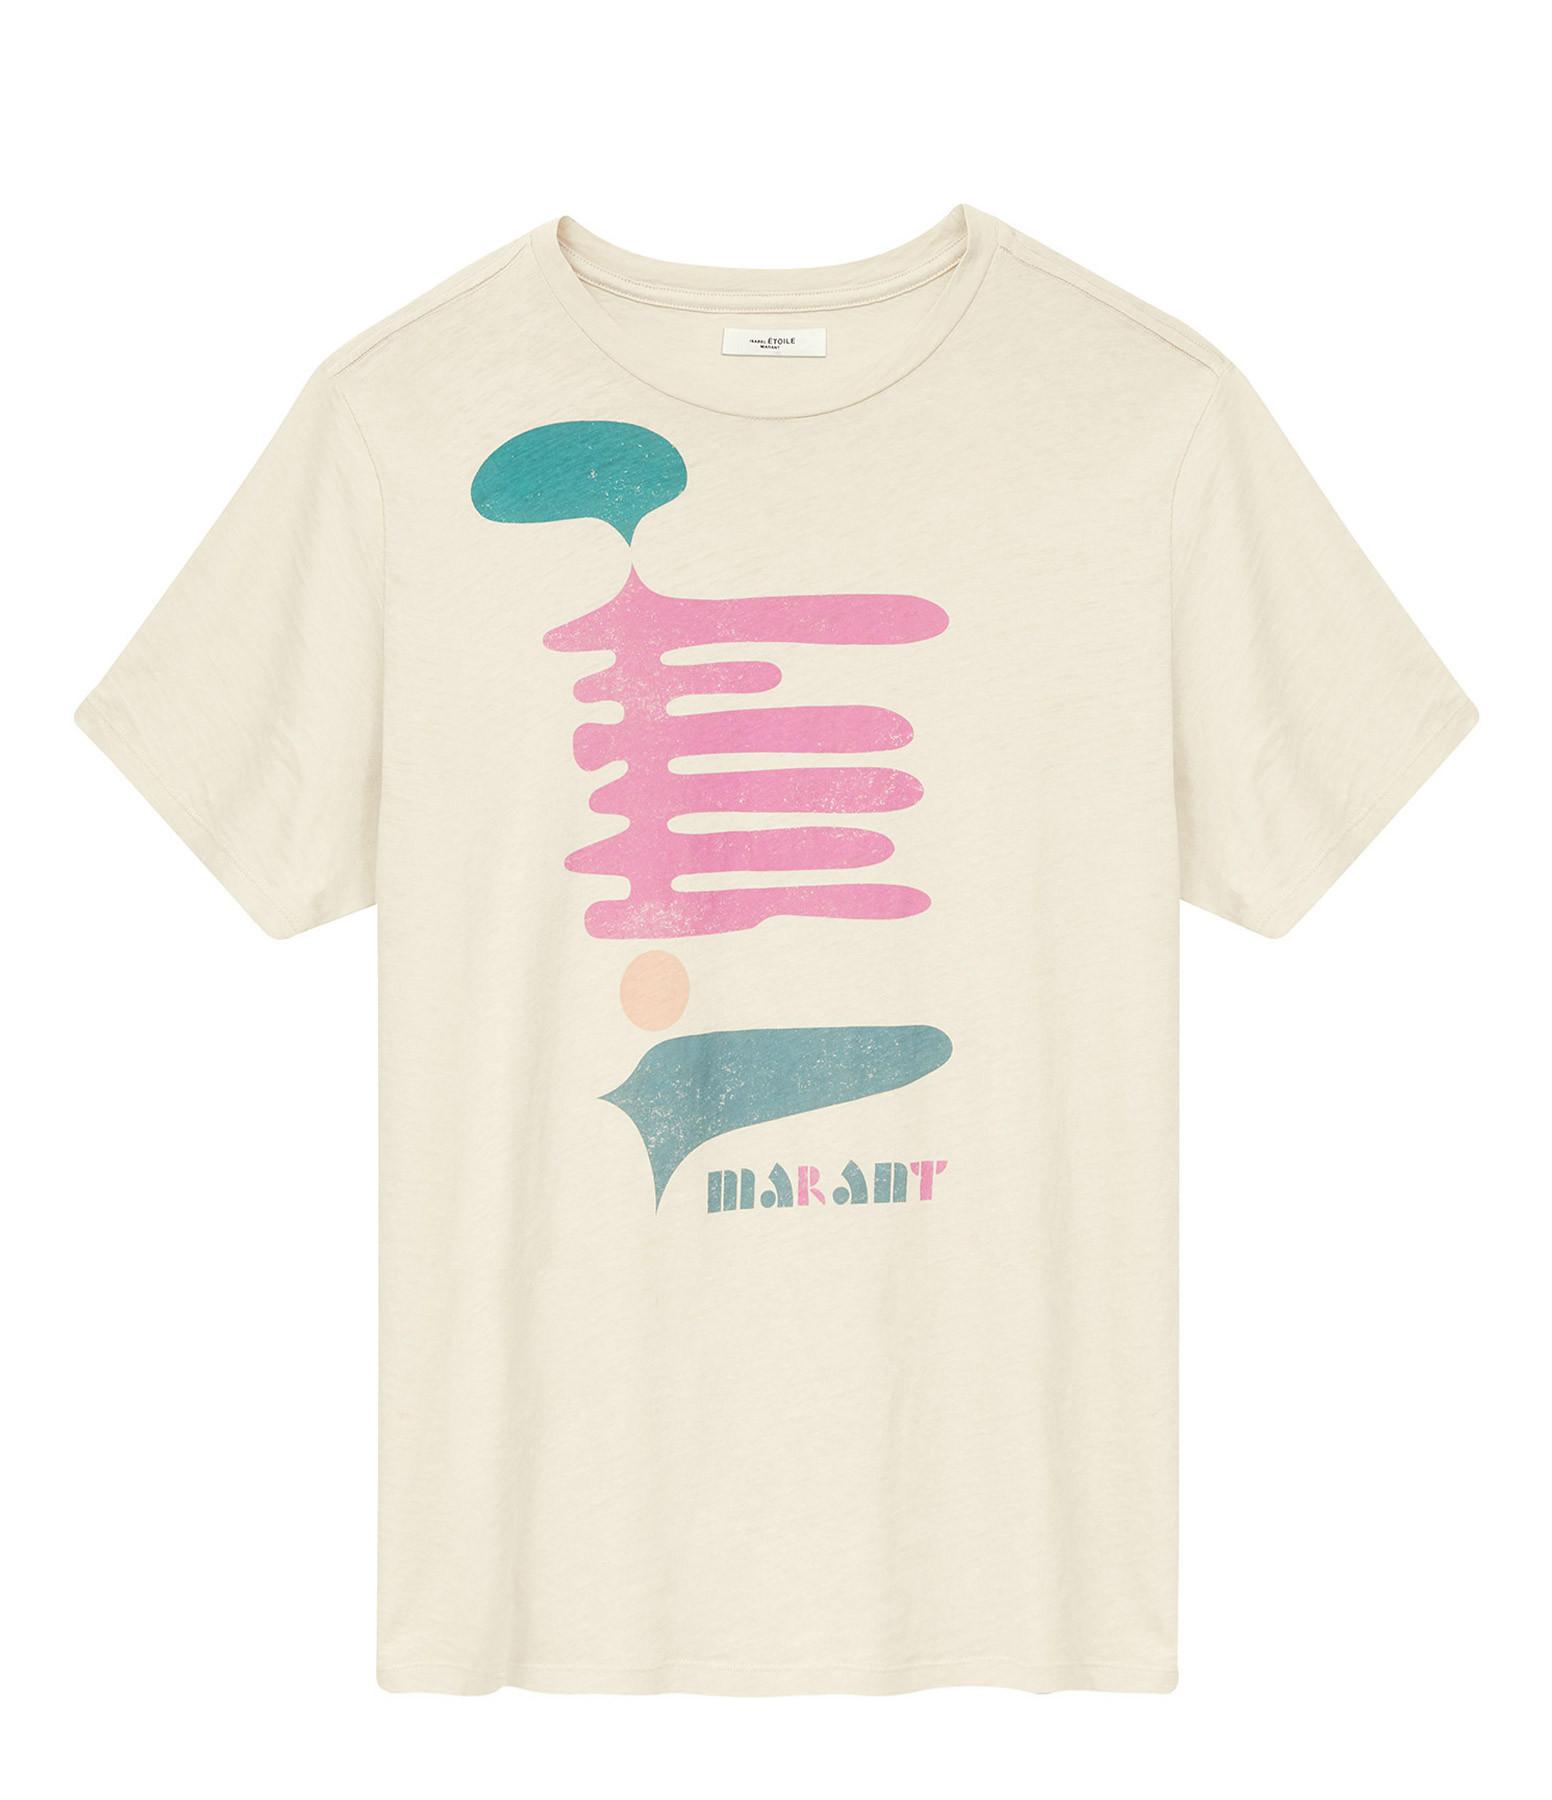 ISABEL MARANT ÉTOILE - Tee-shirt Zewel Coton Imprimé Écru